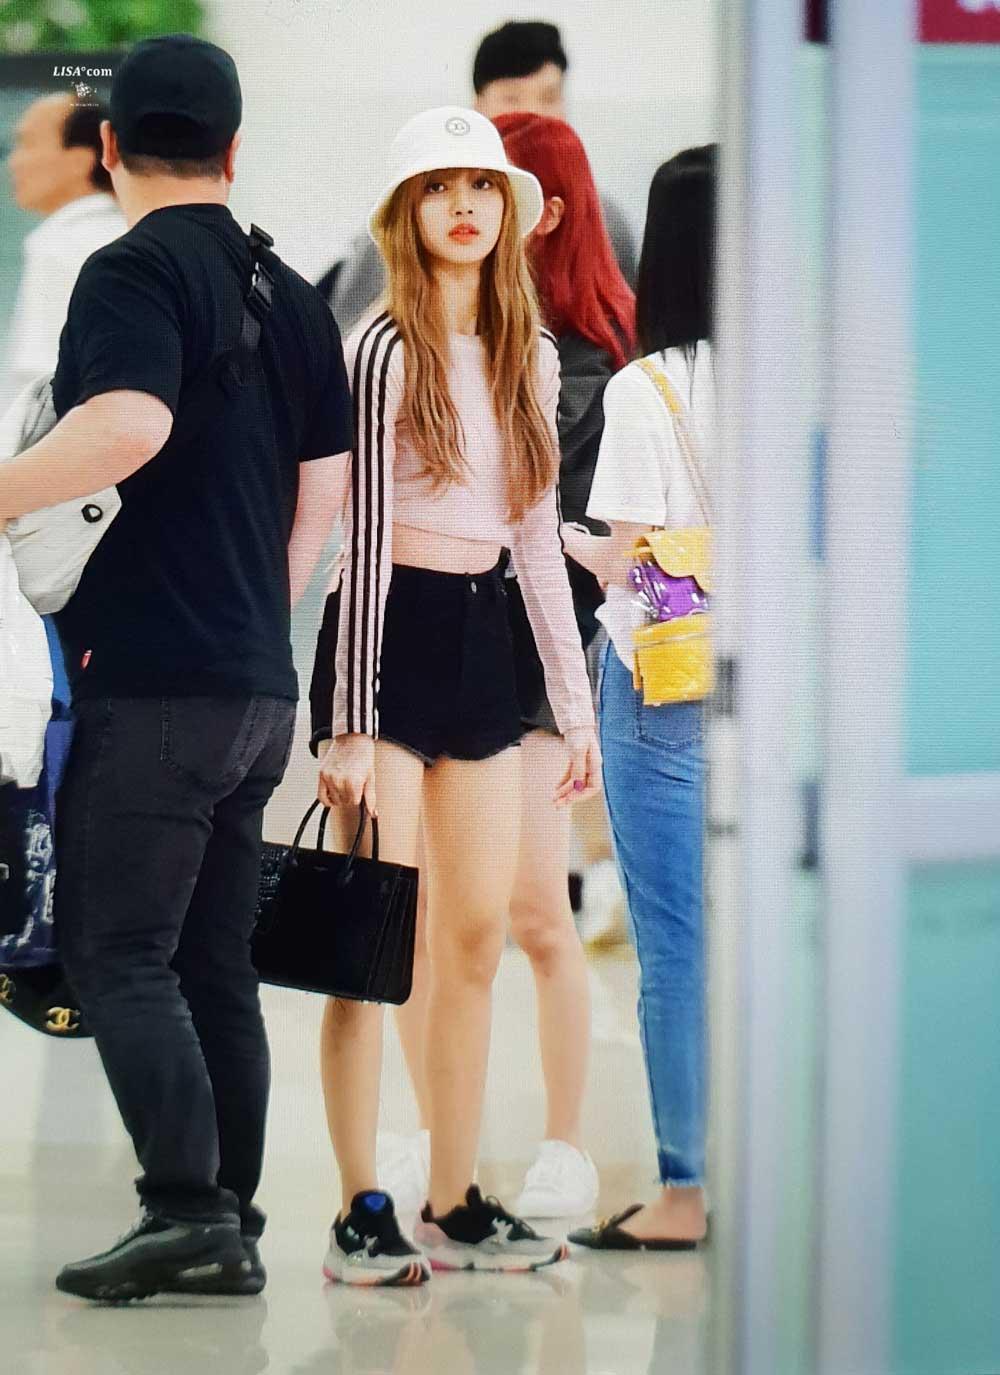 Blackpink Lisa Airport Fashion 4 July 2018 Photo 4